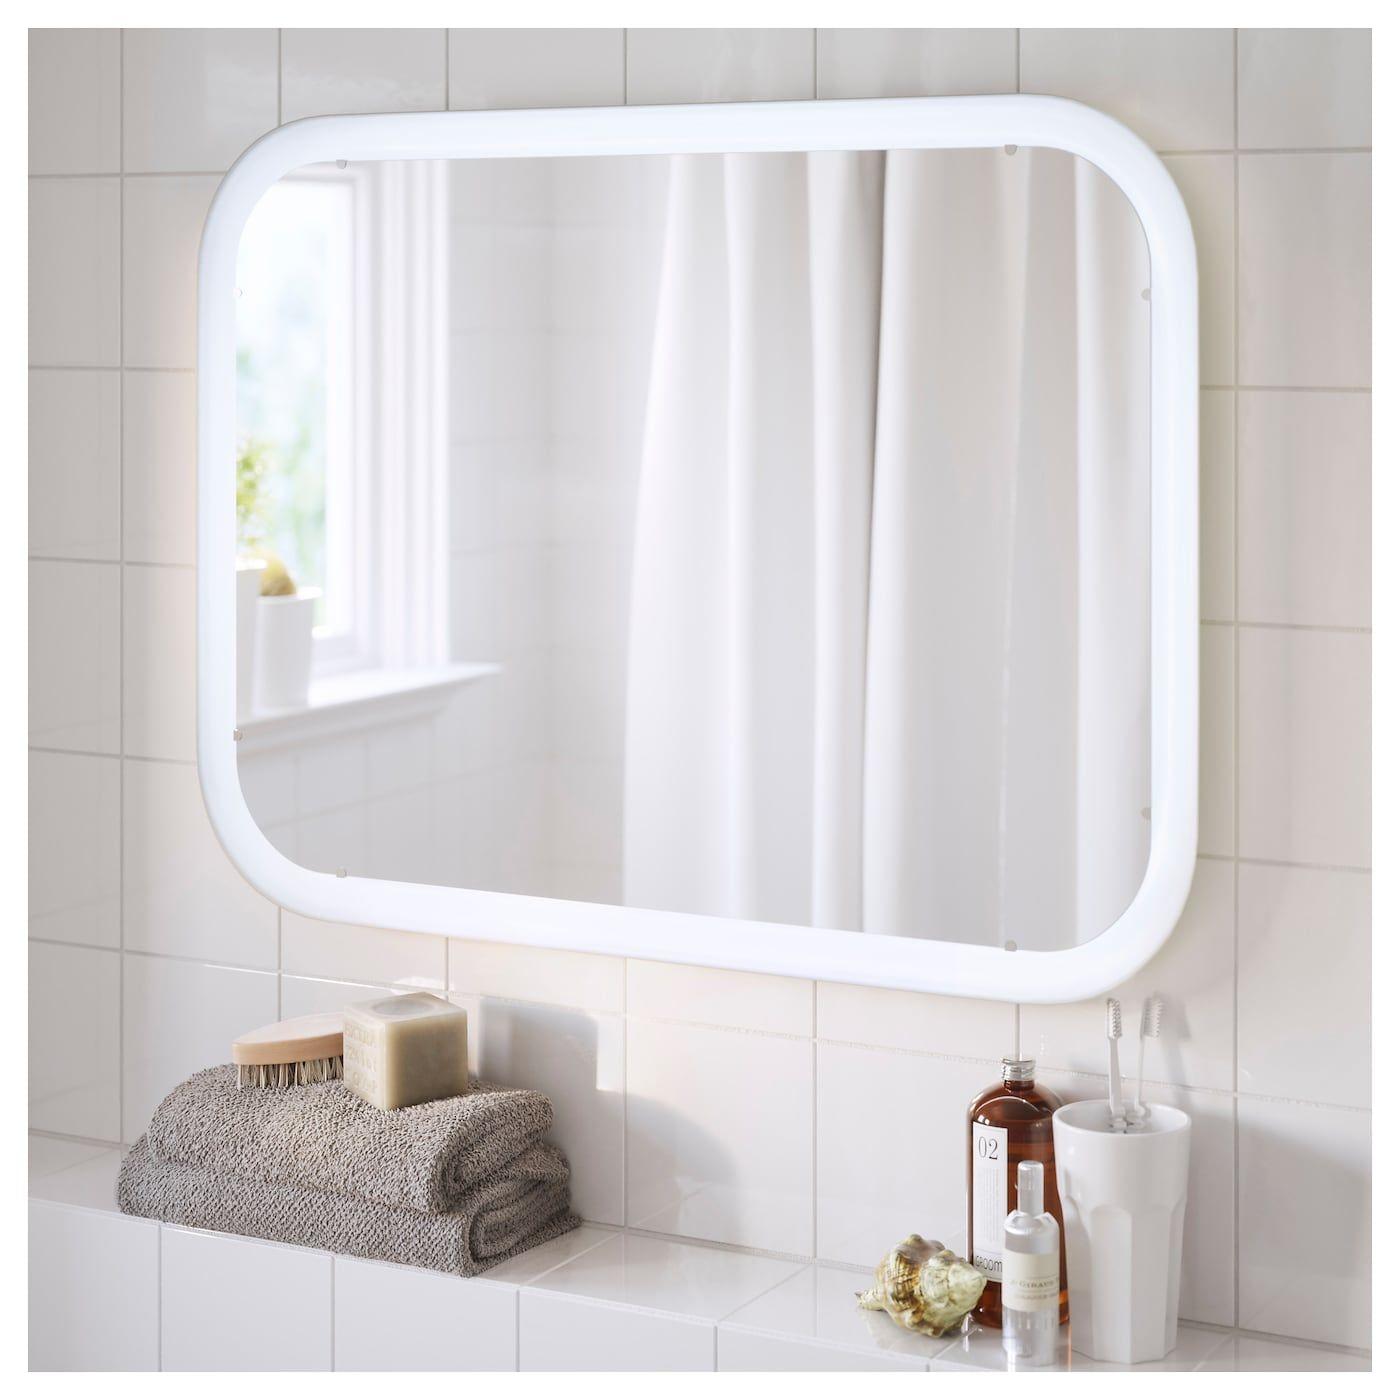 Ikea Bathroom Light Mirror